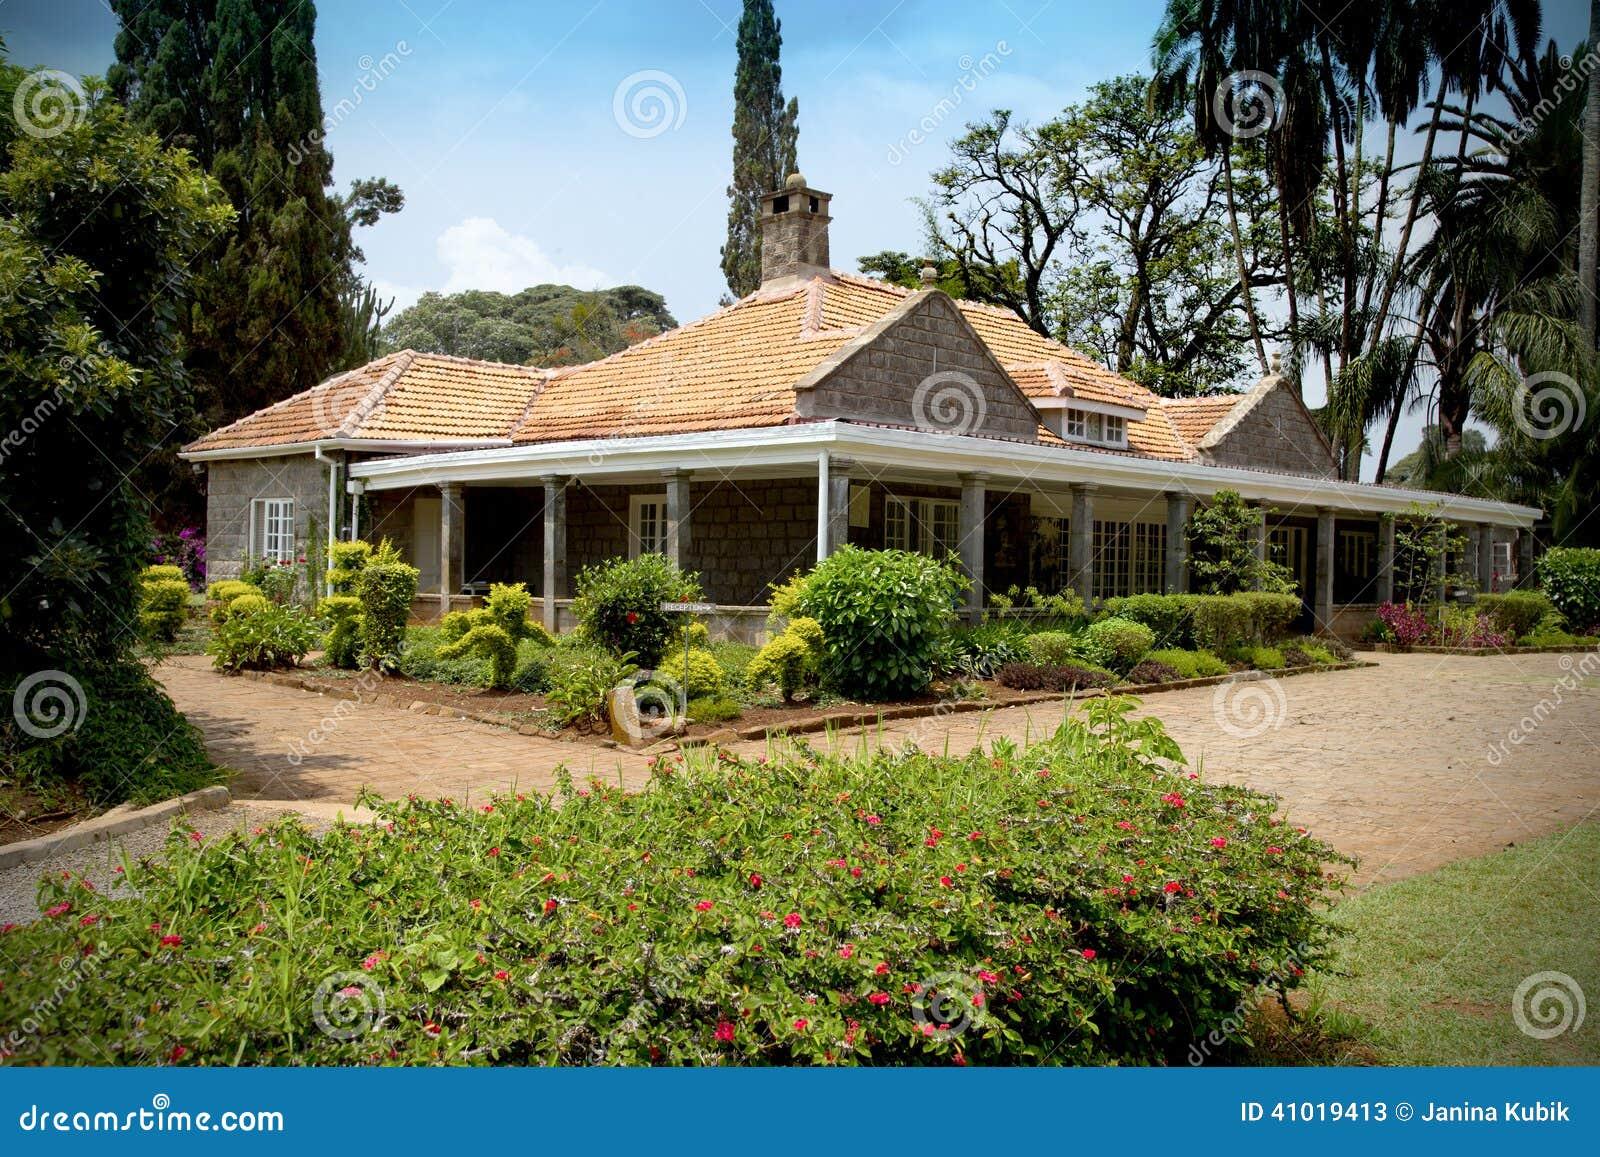 Beautiful house in kenya stock image image of blixsen for Beautiful house designs kenya